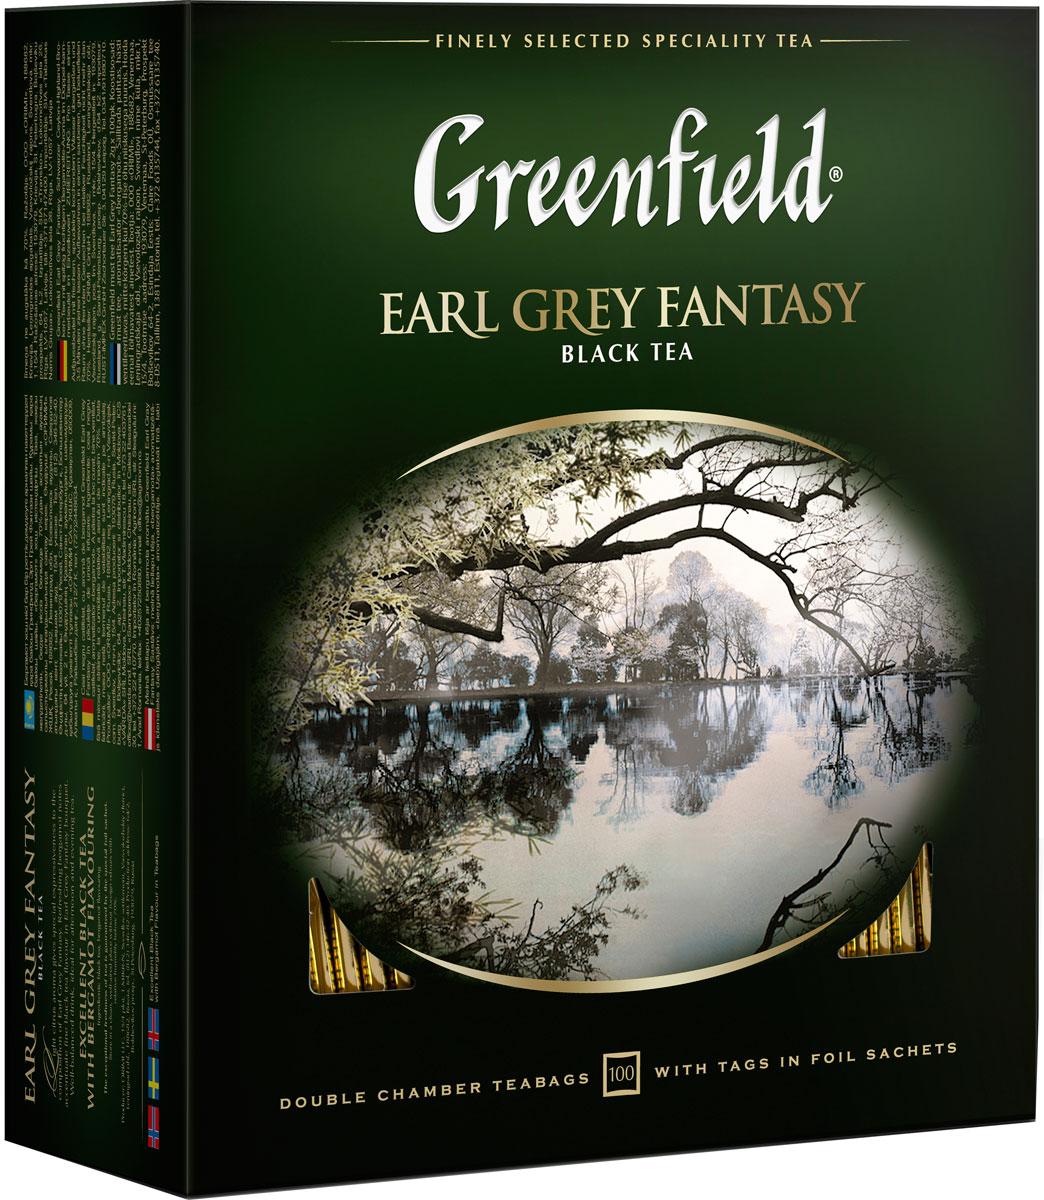 Фото - Greenfield Earl Grey Fantasy черный ароматизированный чай в пакетиках, 100 шт greenfield earl grey fantasy черный листовой чай 200 г